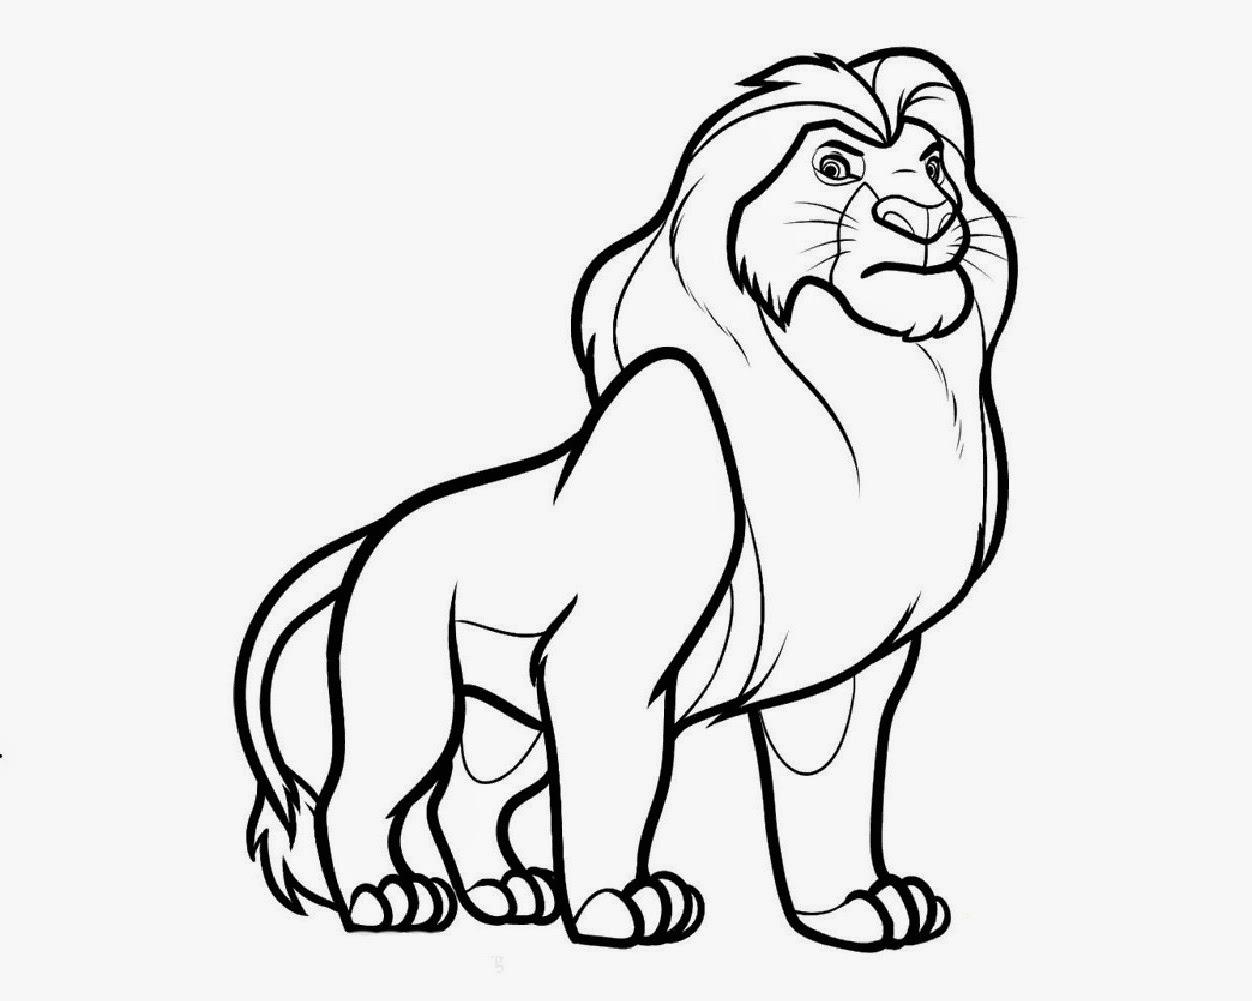 1252x1001 Easy Diy Cartoon Drawings For Kids23. How To Draw A Cute Cartoon